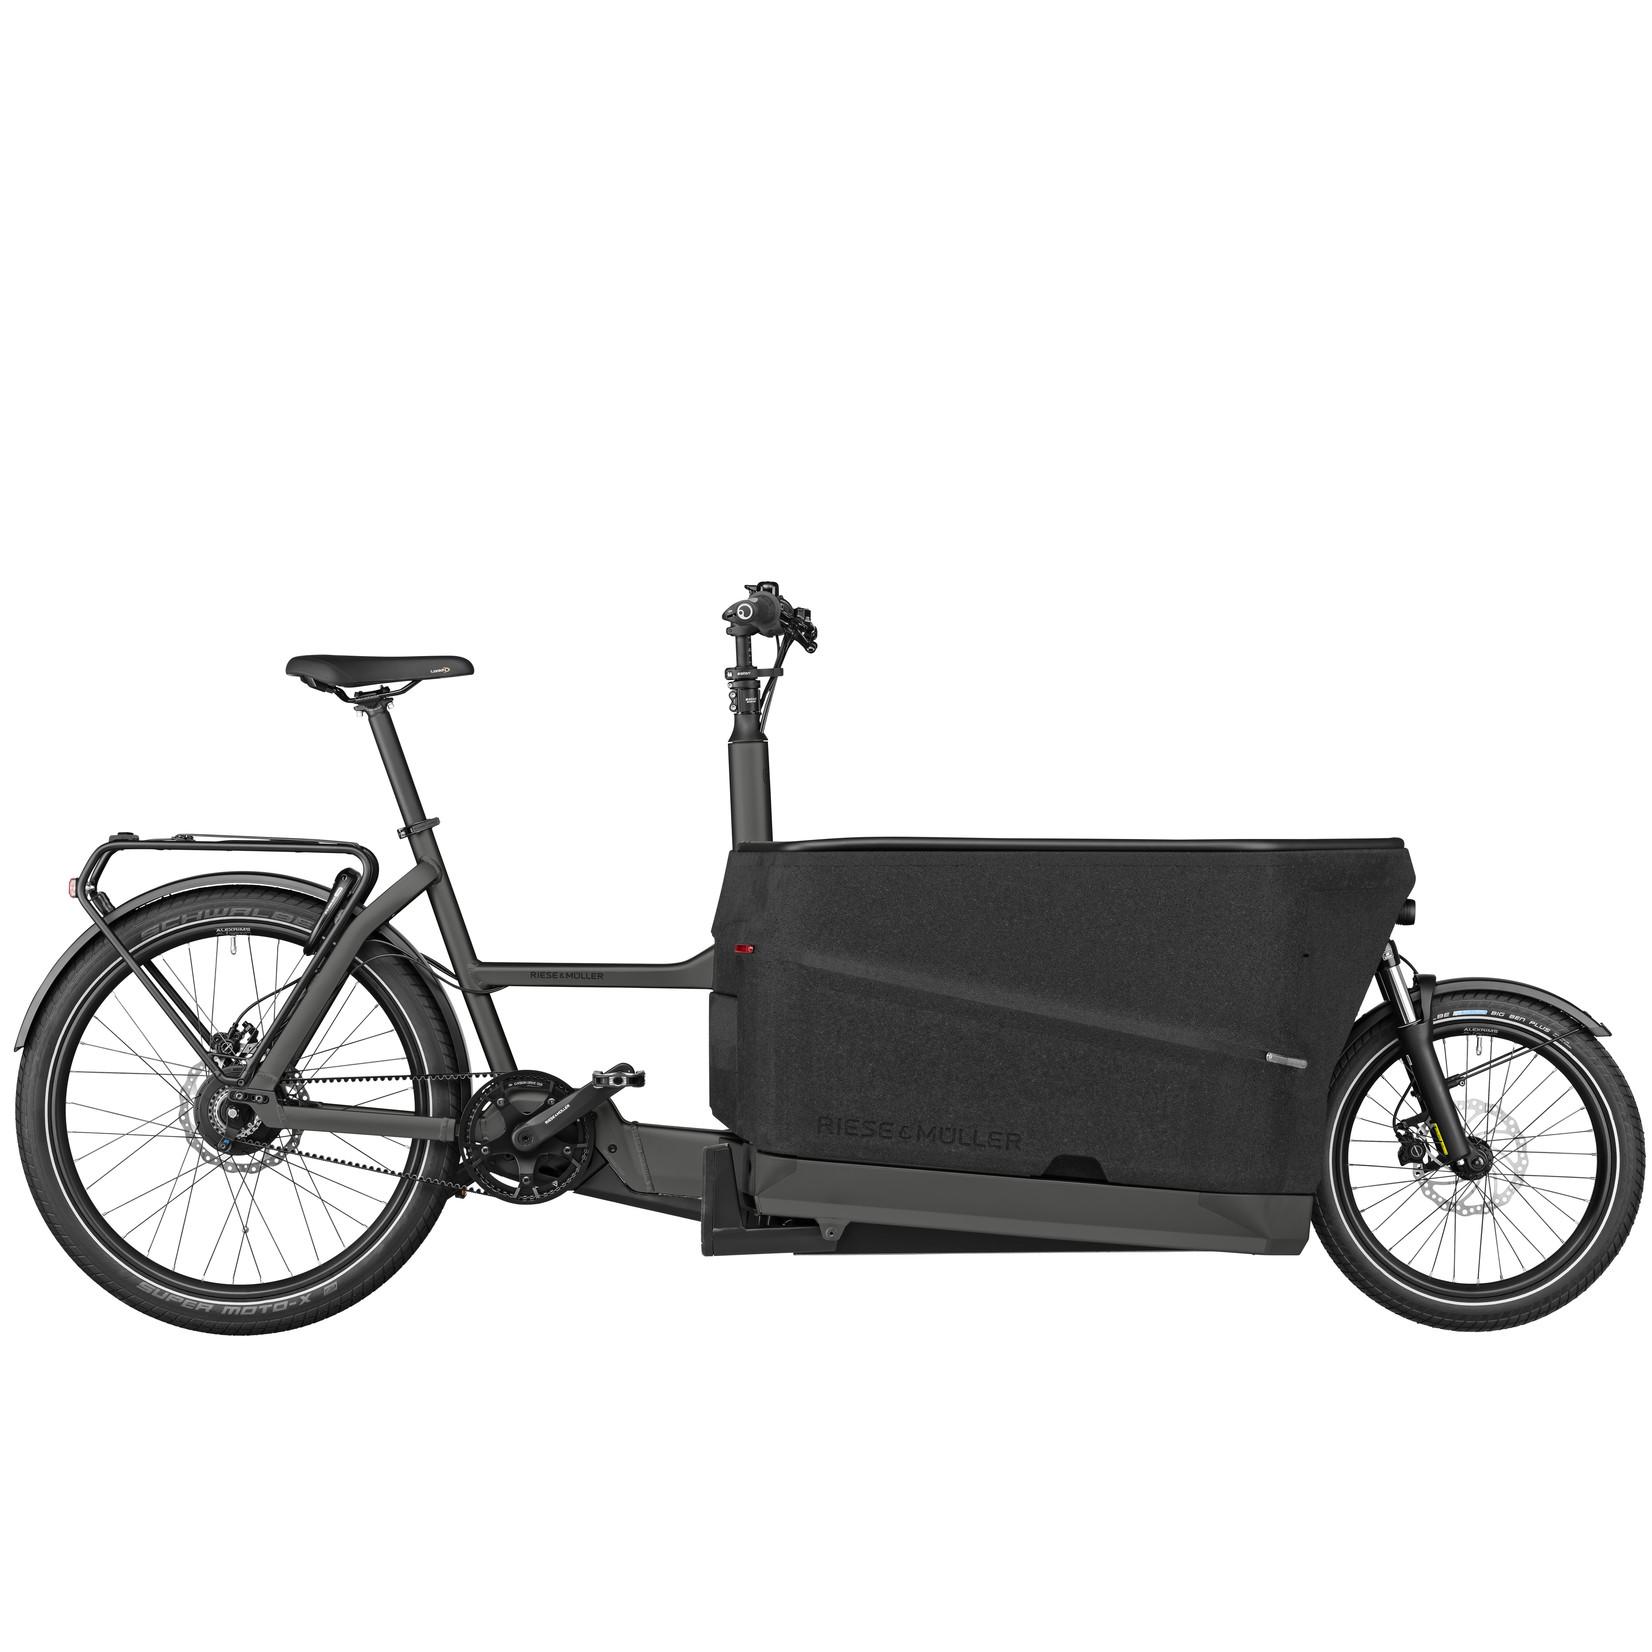 Riese & Muller Riese & Muller, Packster 70 Vario, Urban Grey Matt